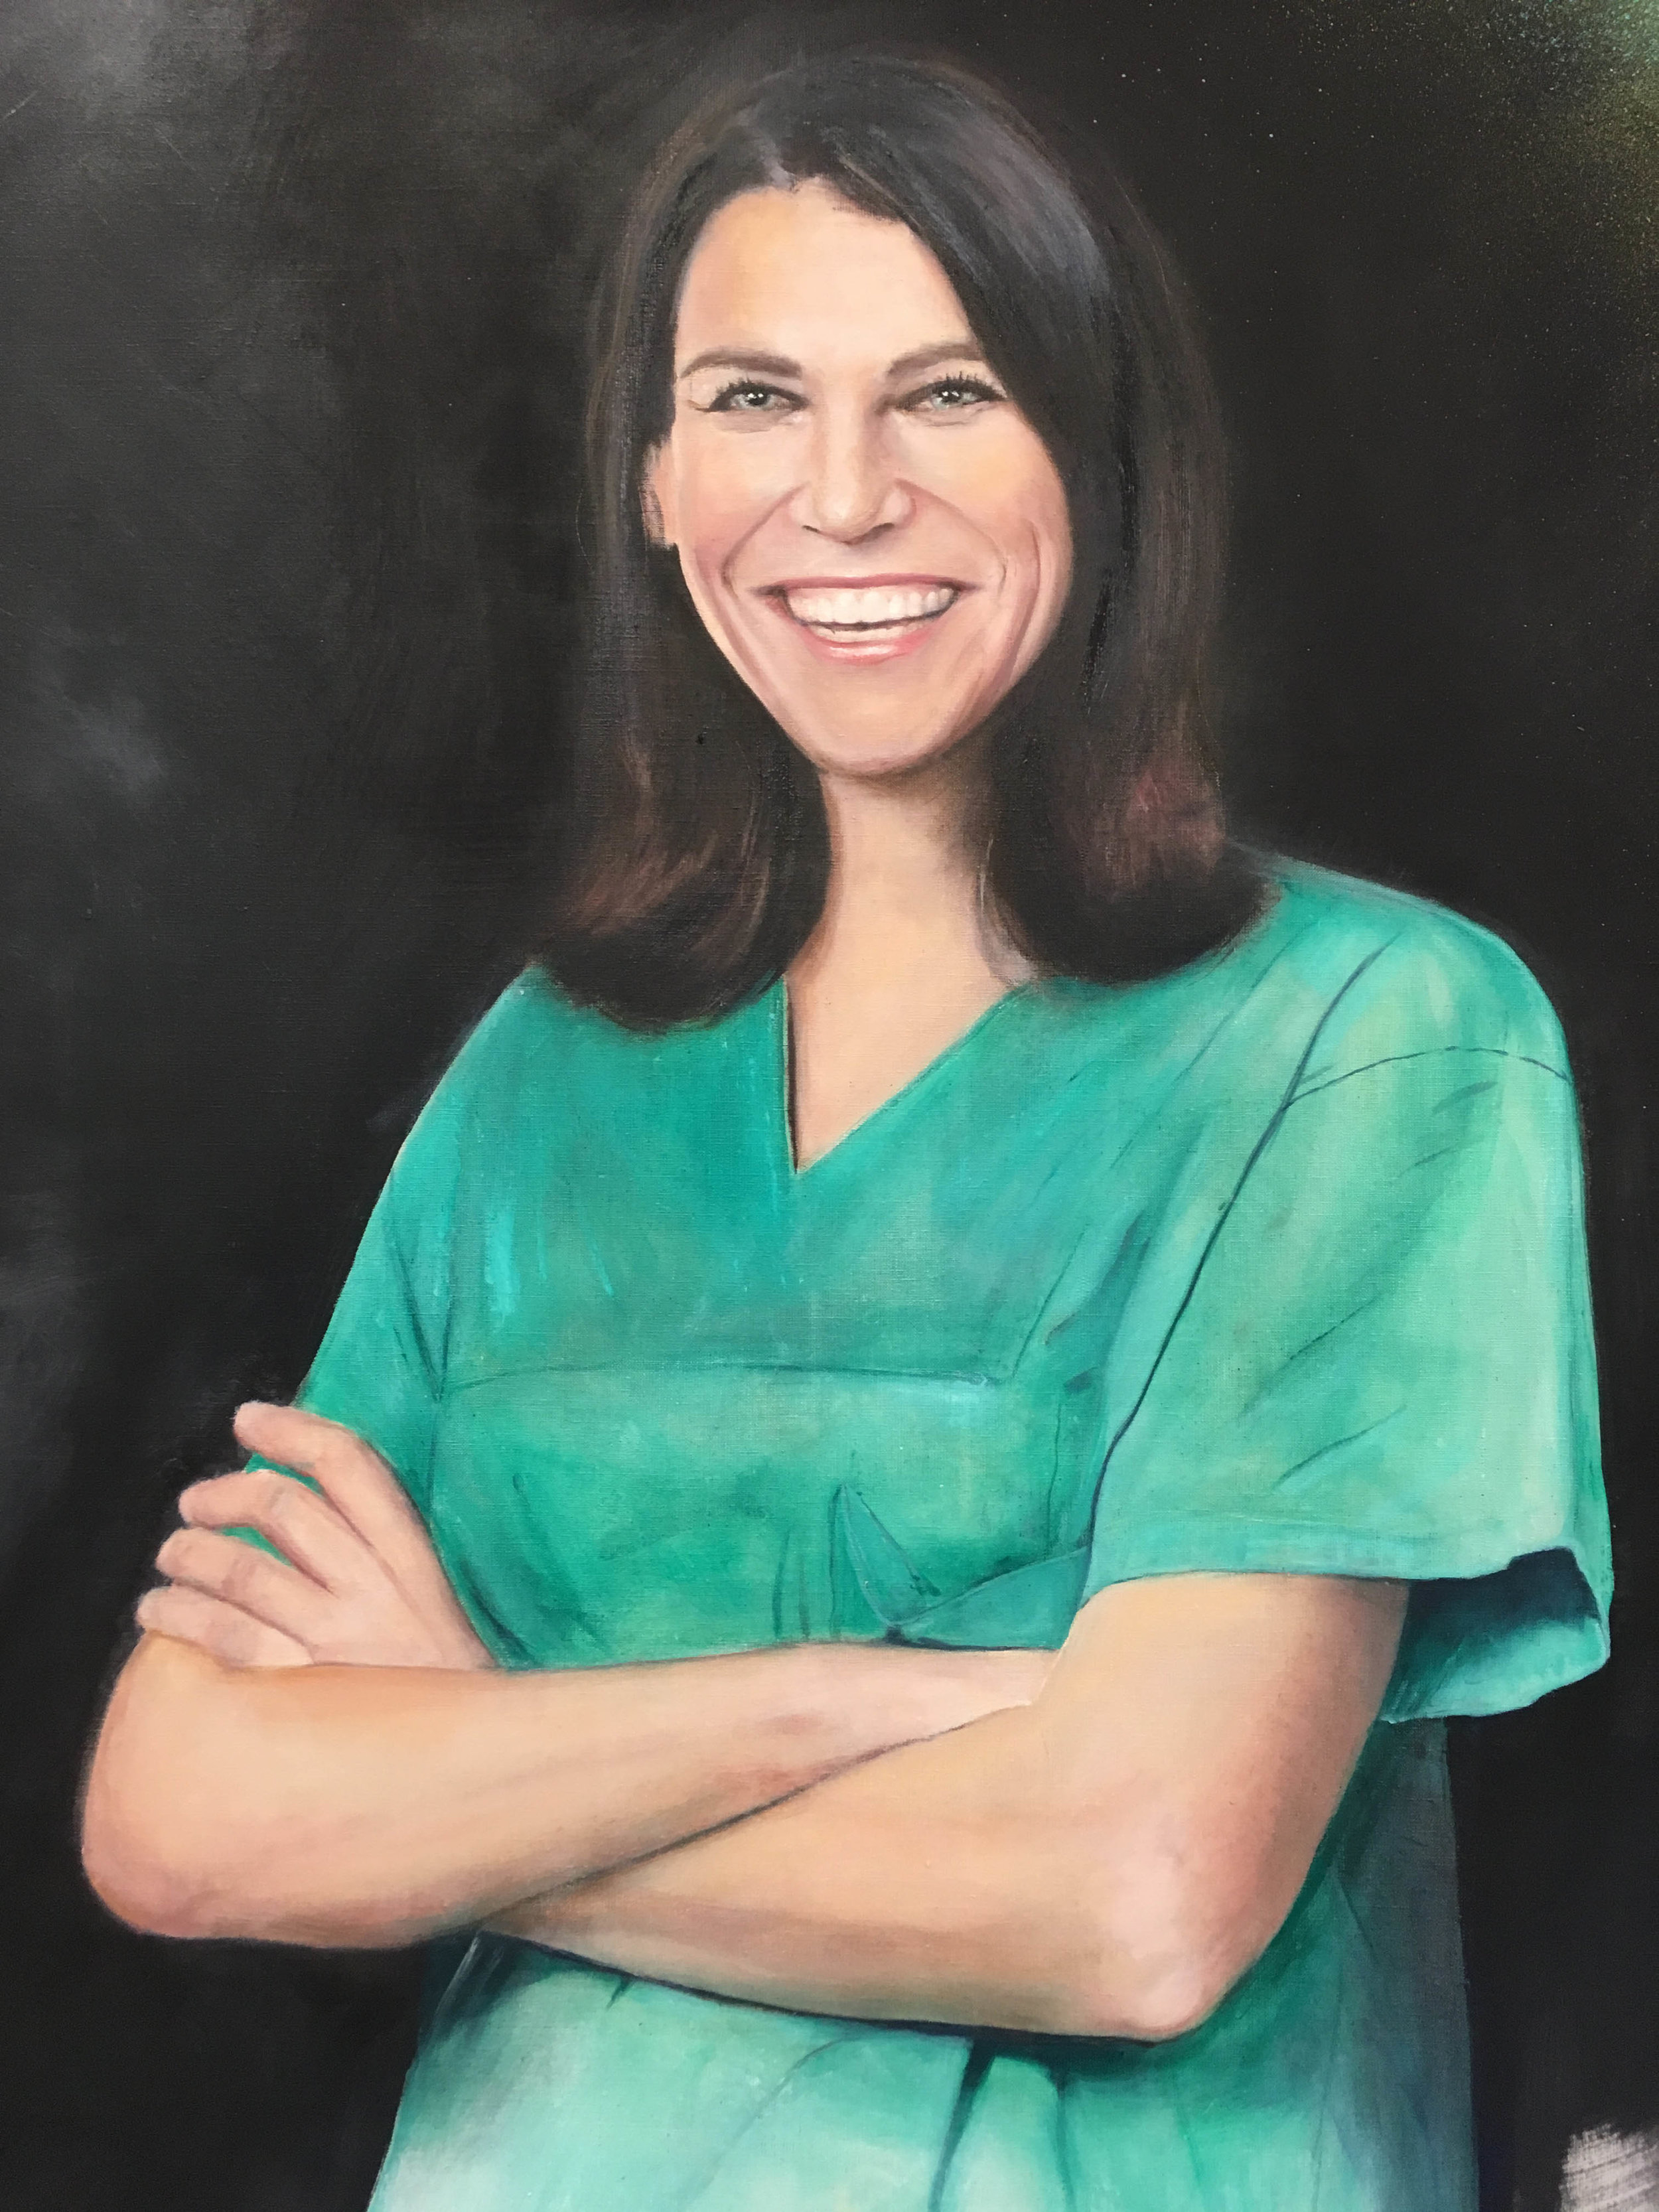 Ms Marion Kiechle